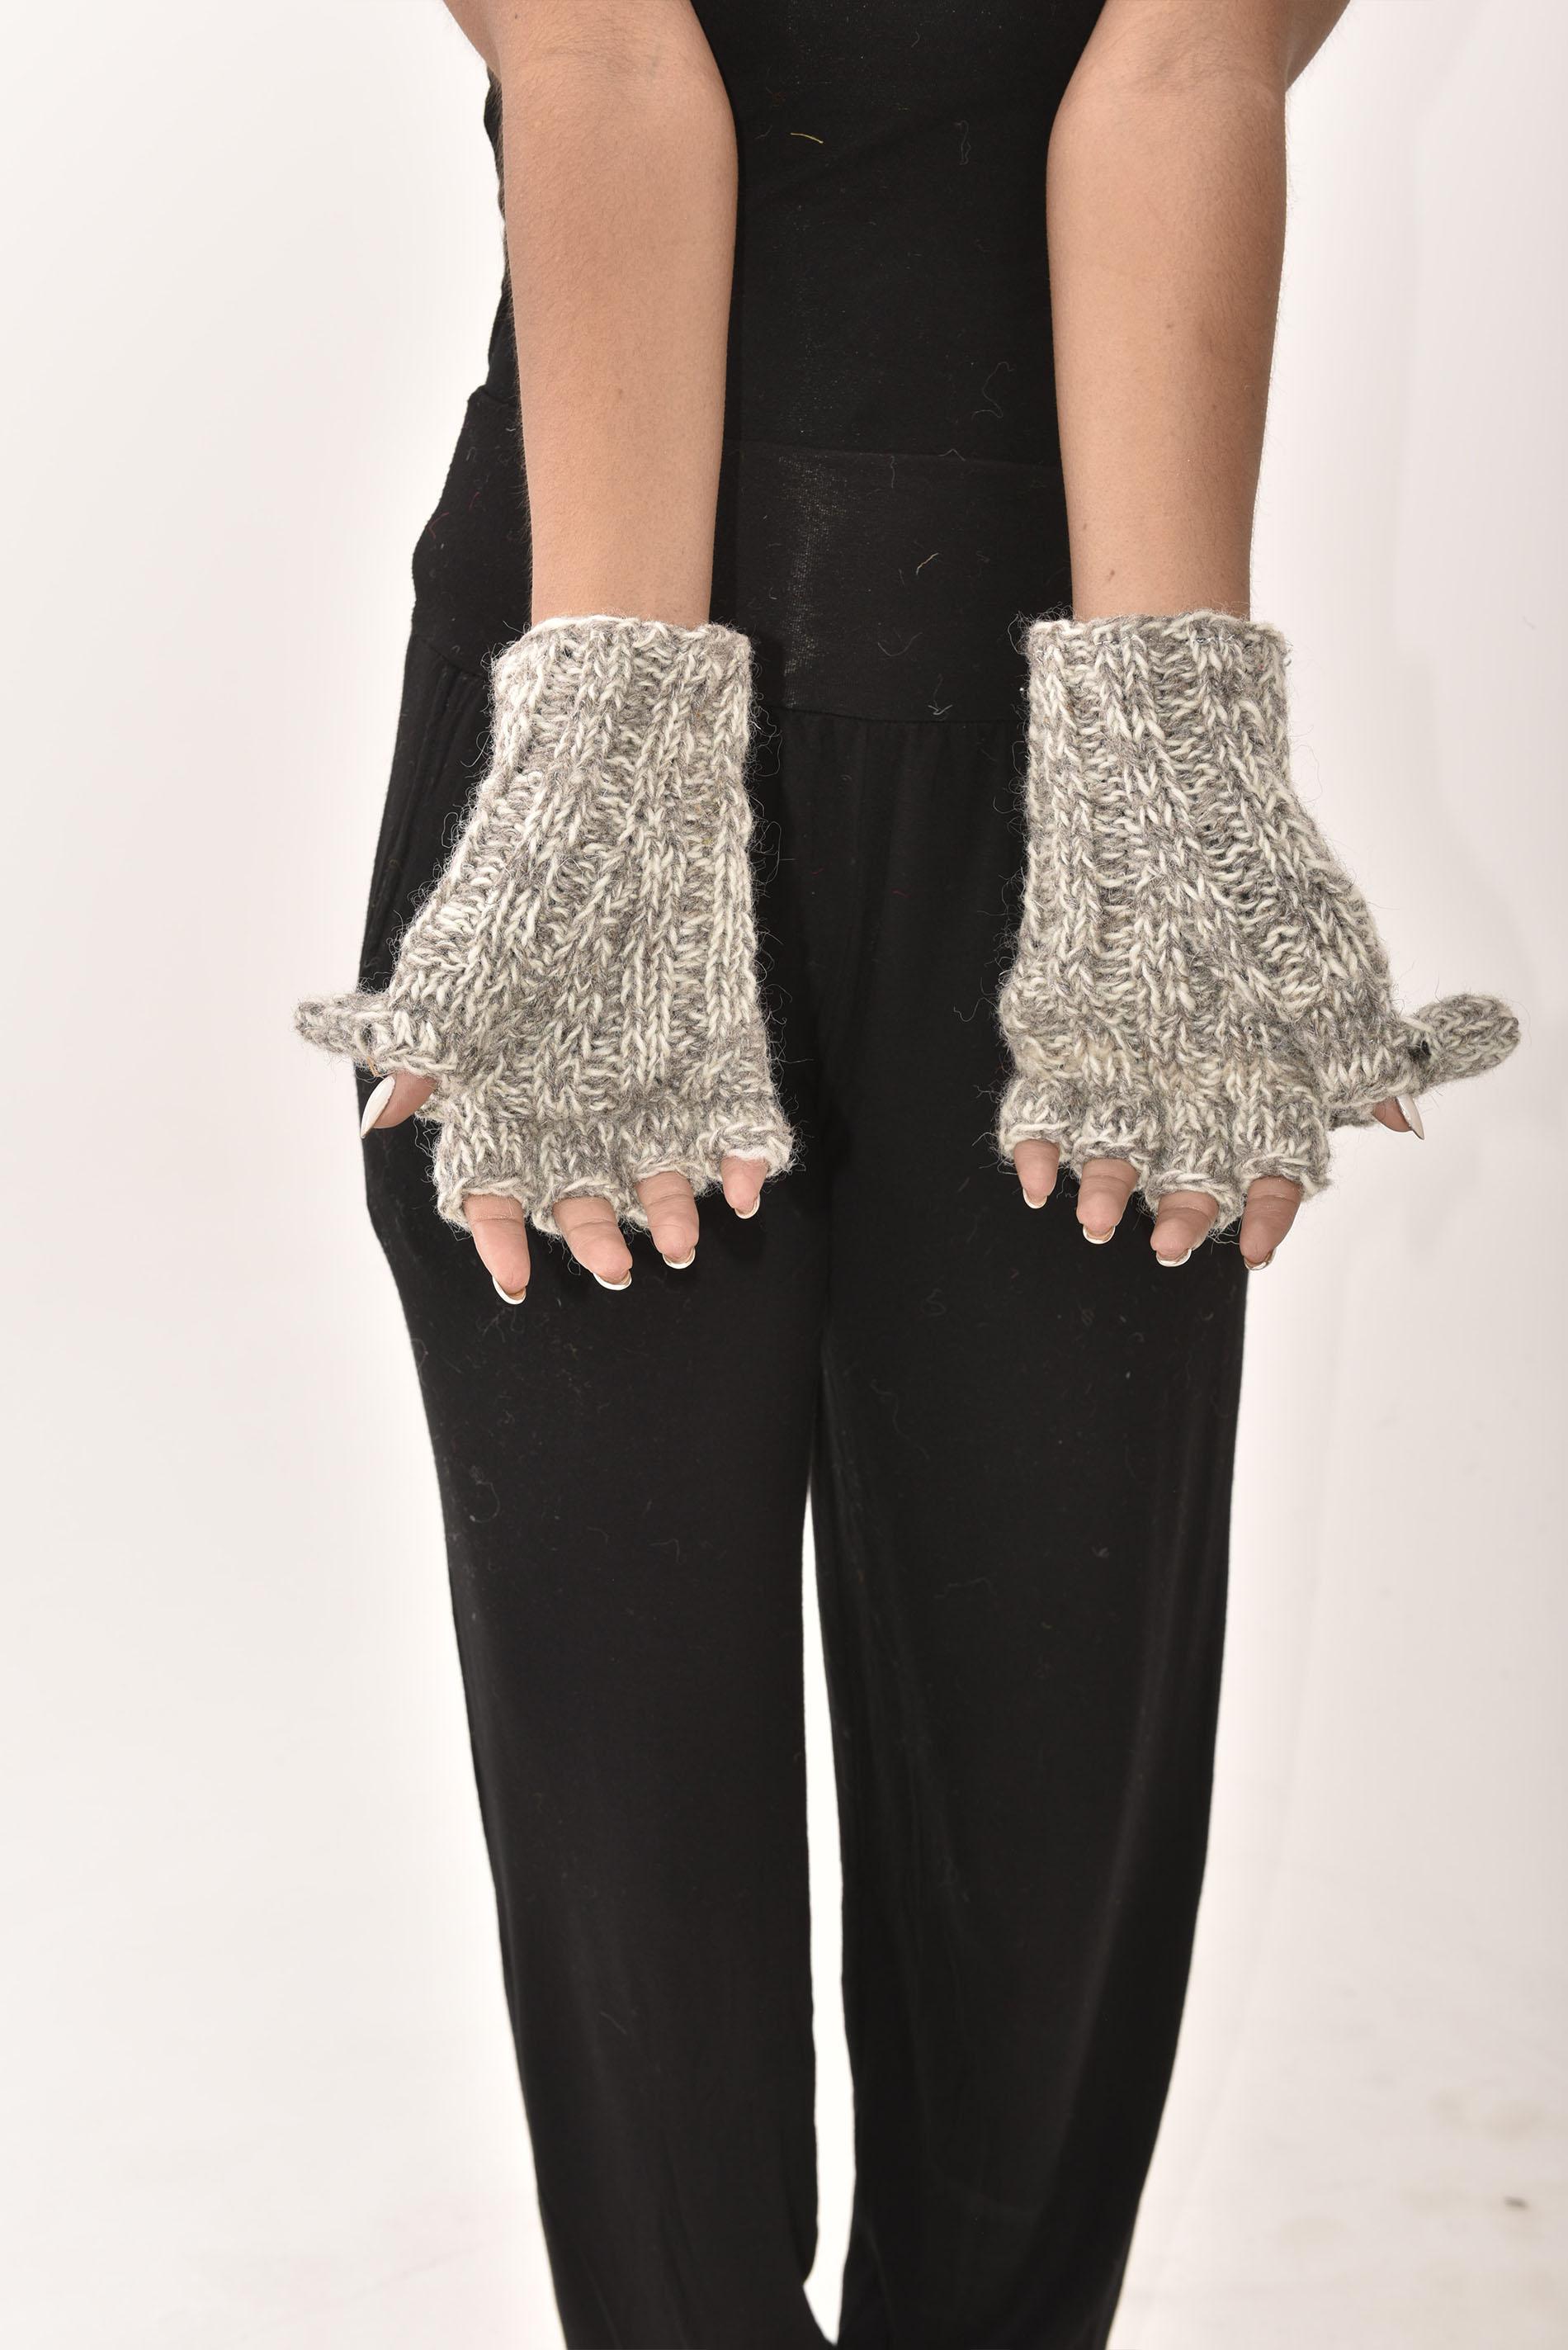 More Wool Glittens